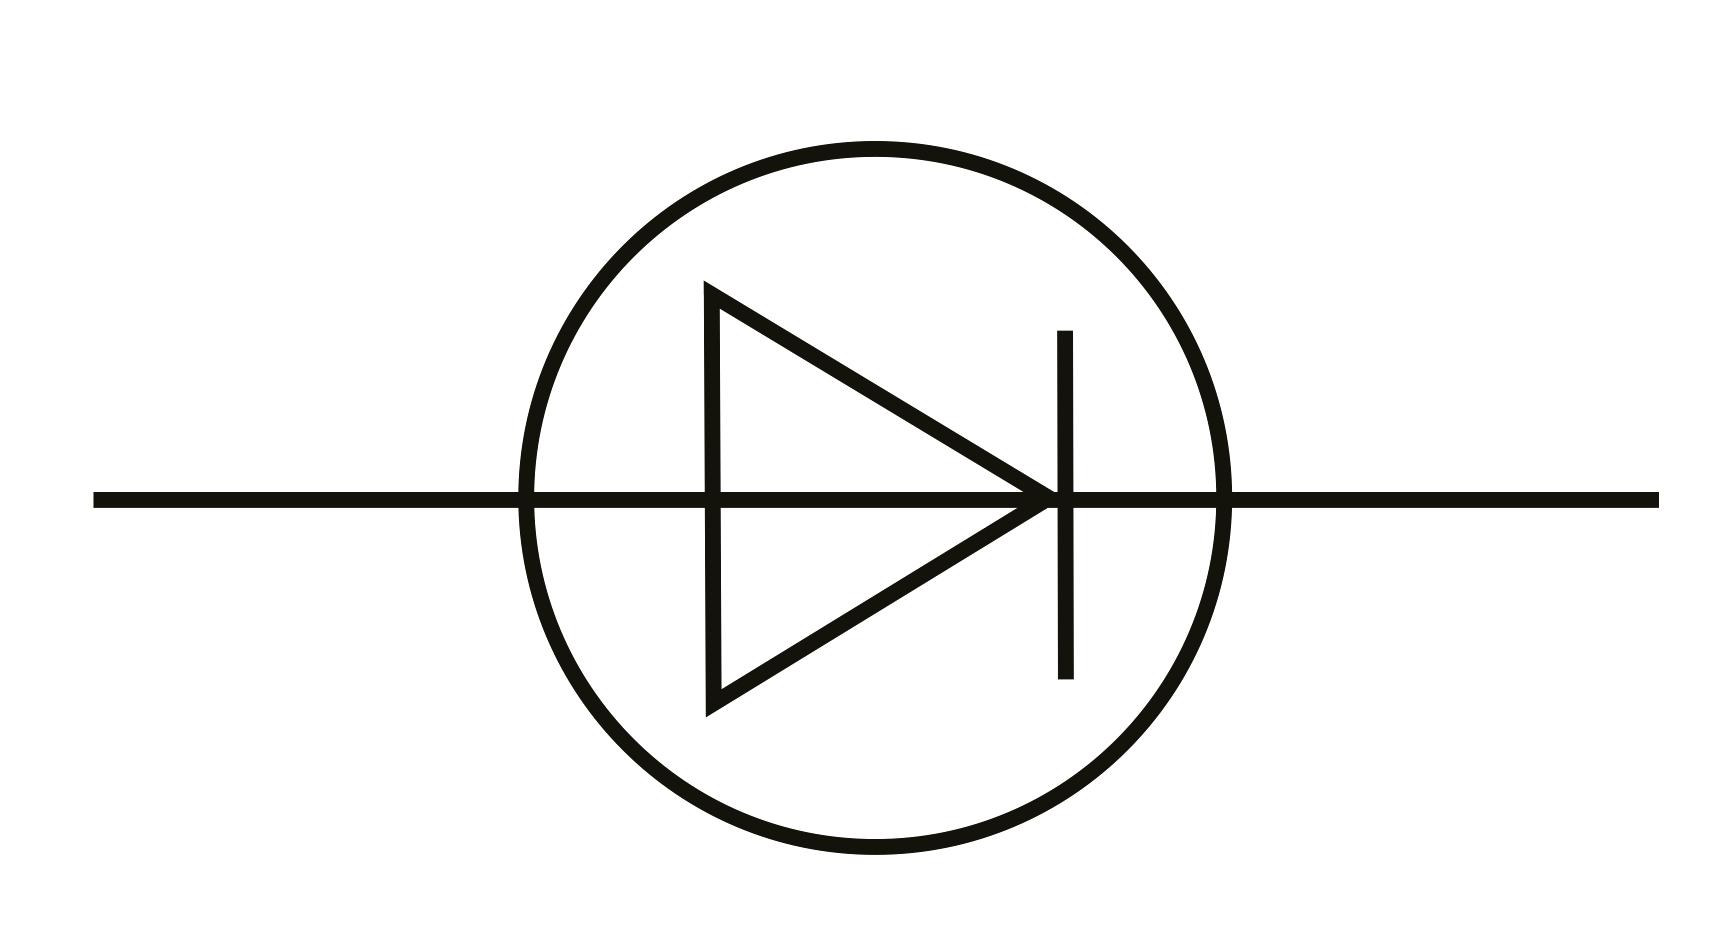 diode symbol electrical symbols